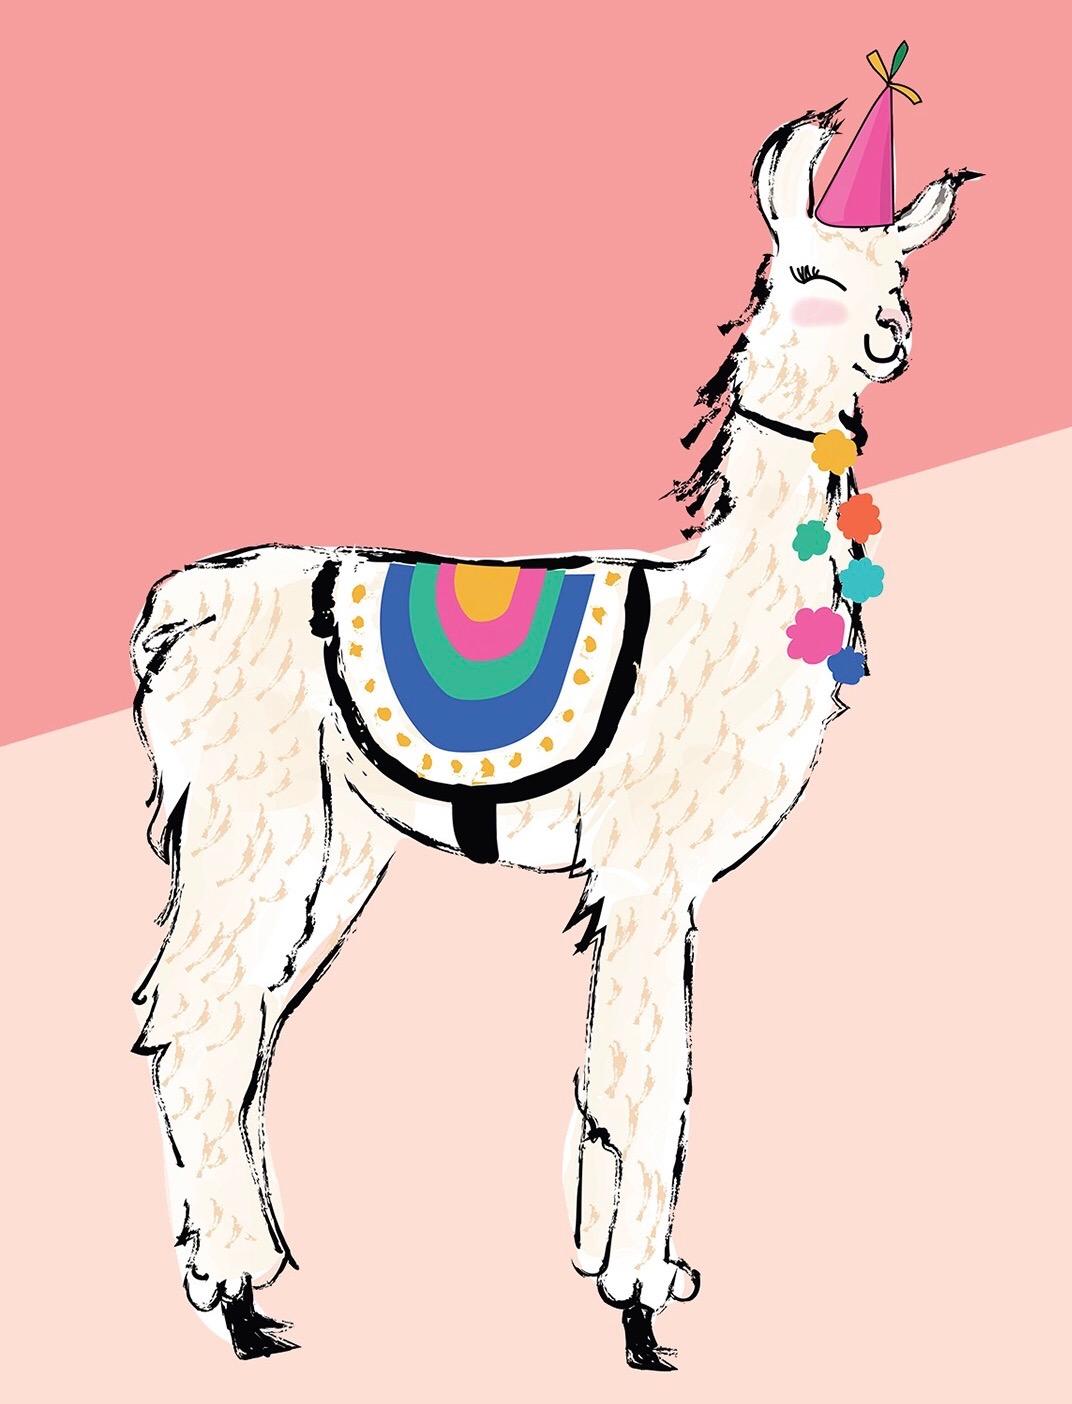 Alpaca llama clipart image royalty free stock Llamas Clipart | Free download best Llamas Clipart on ClipArtMag.com image royalty free stock